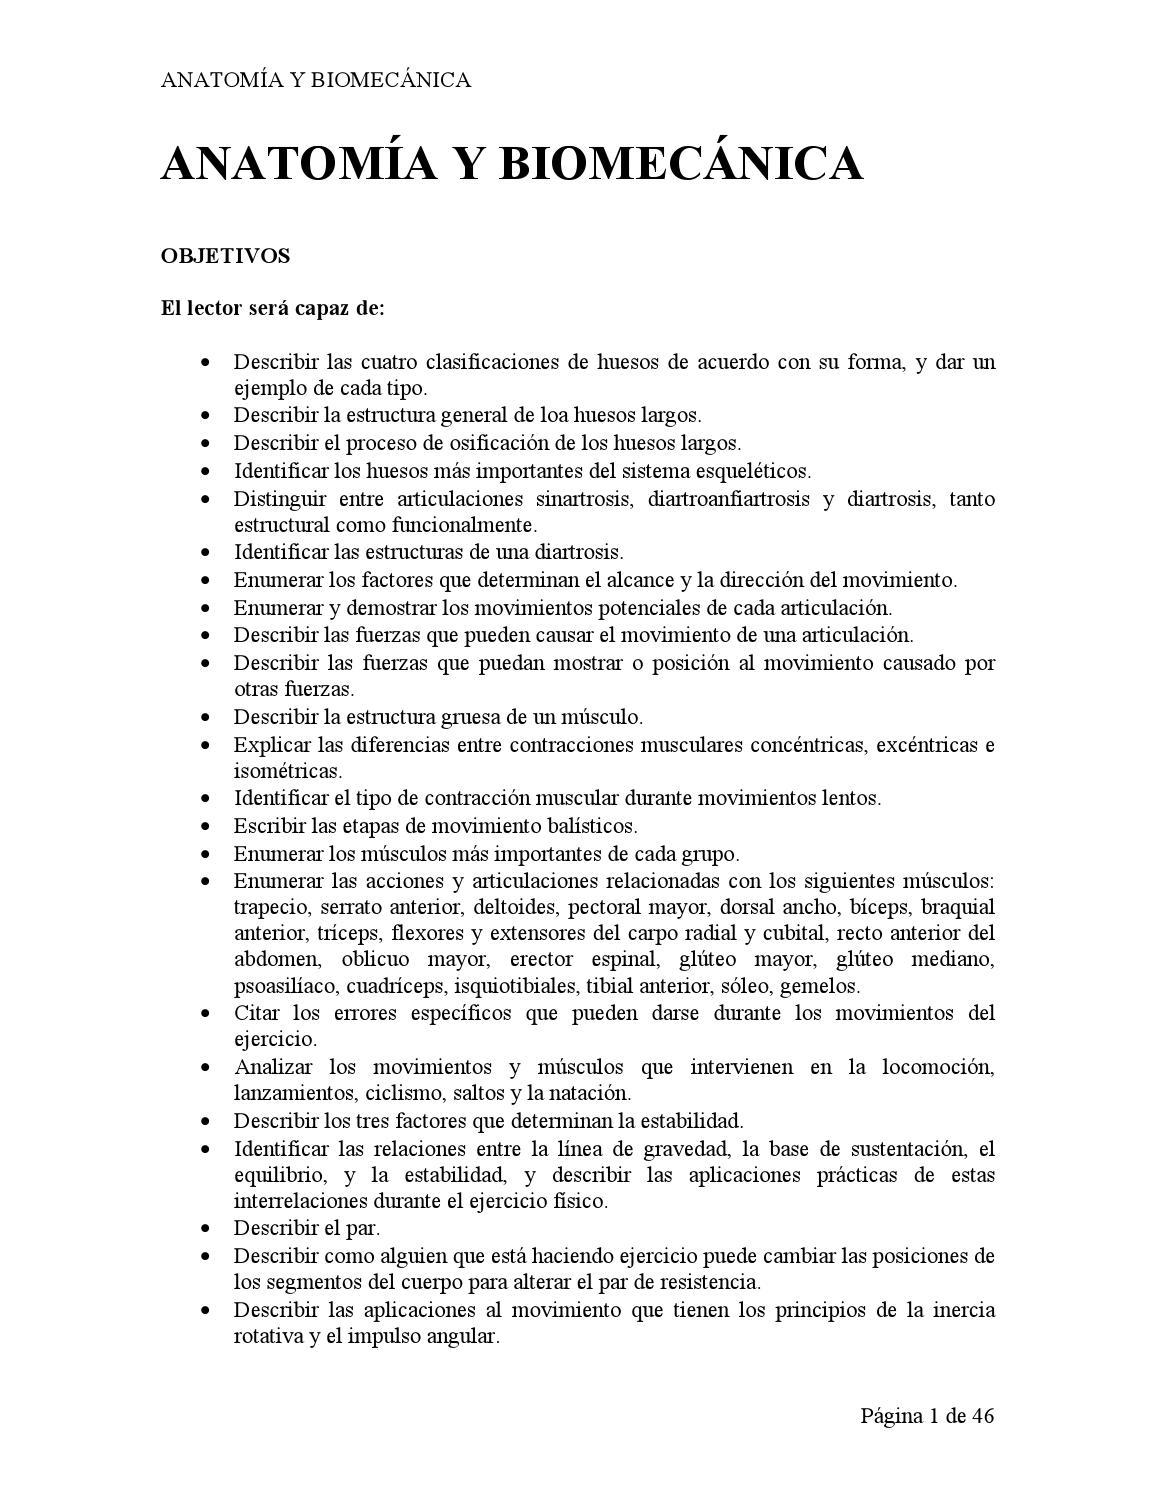 Anatomia y biomecanica by lahuel rojas - issuu